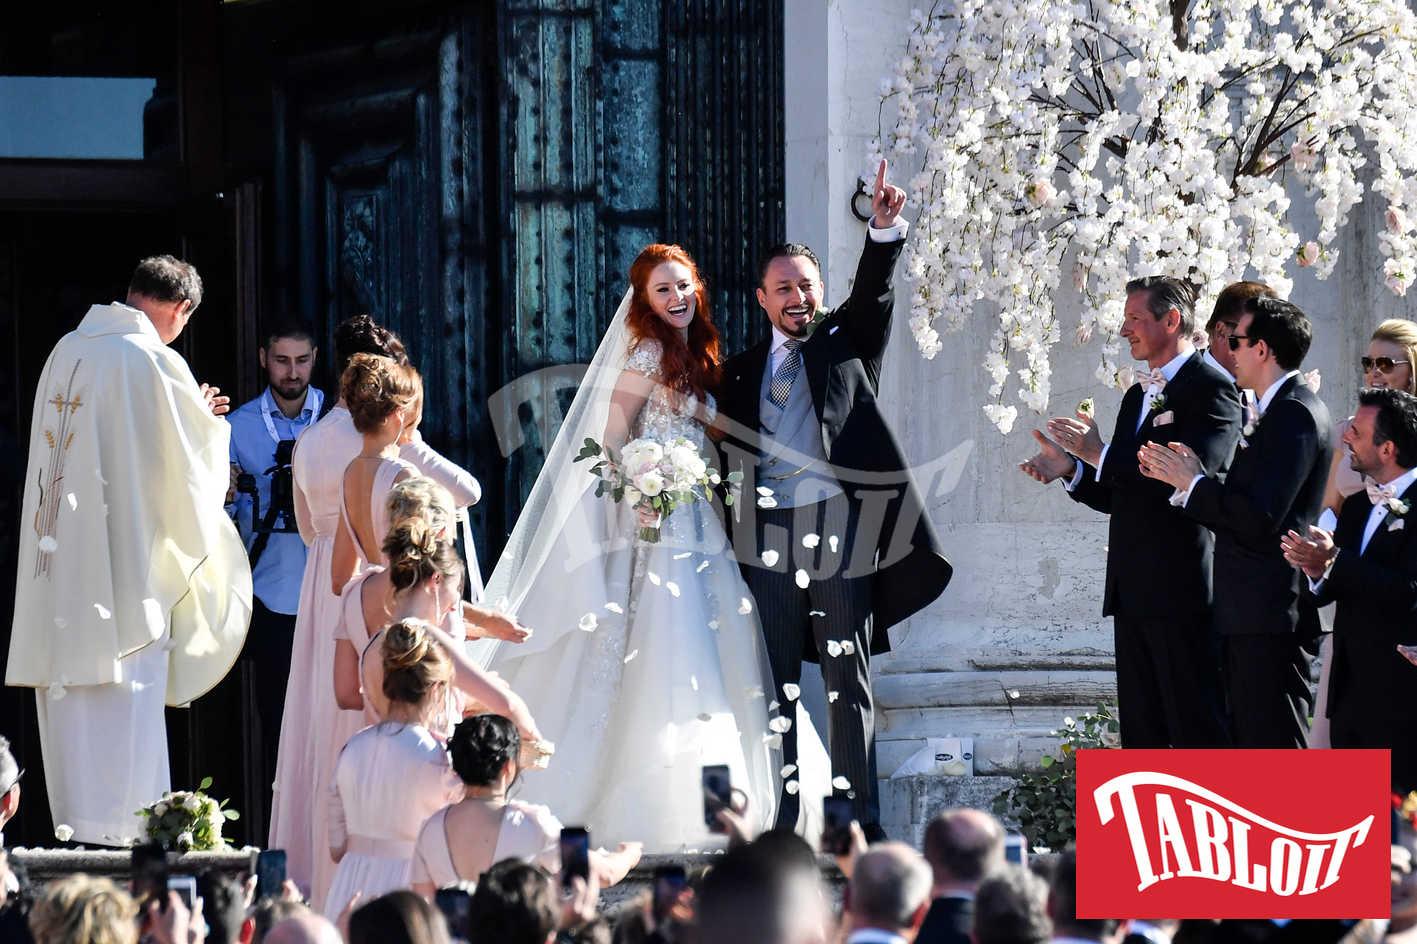 Barbara Meier e Klemens Hallmann matrimonio a venezia